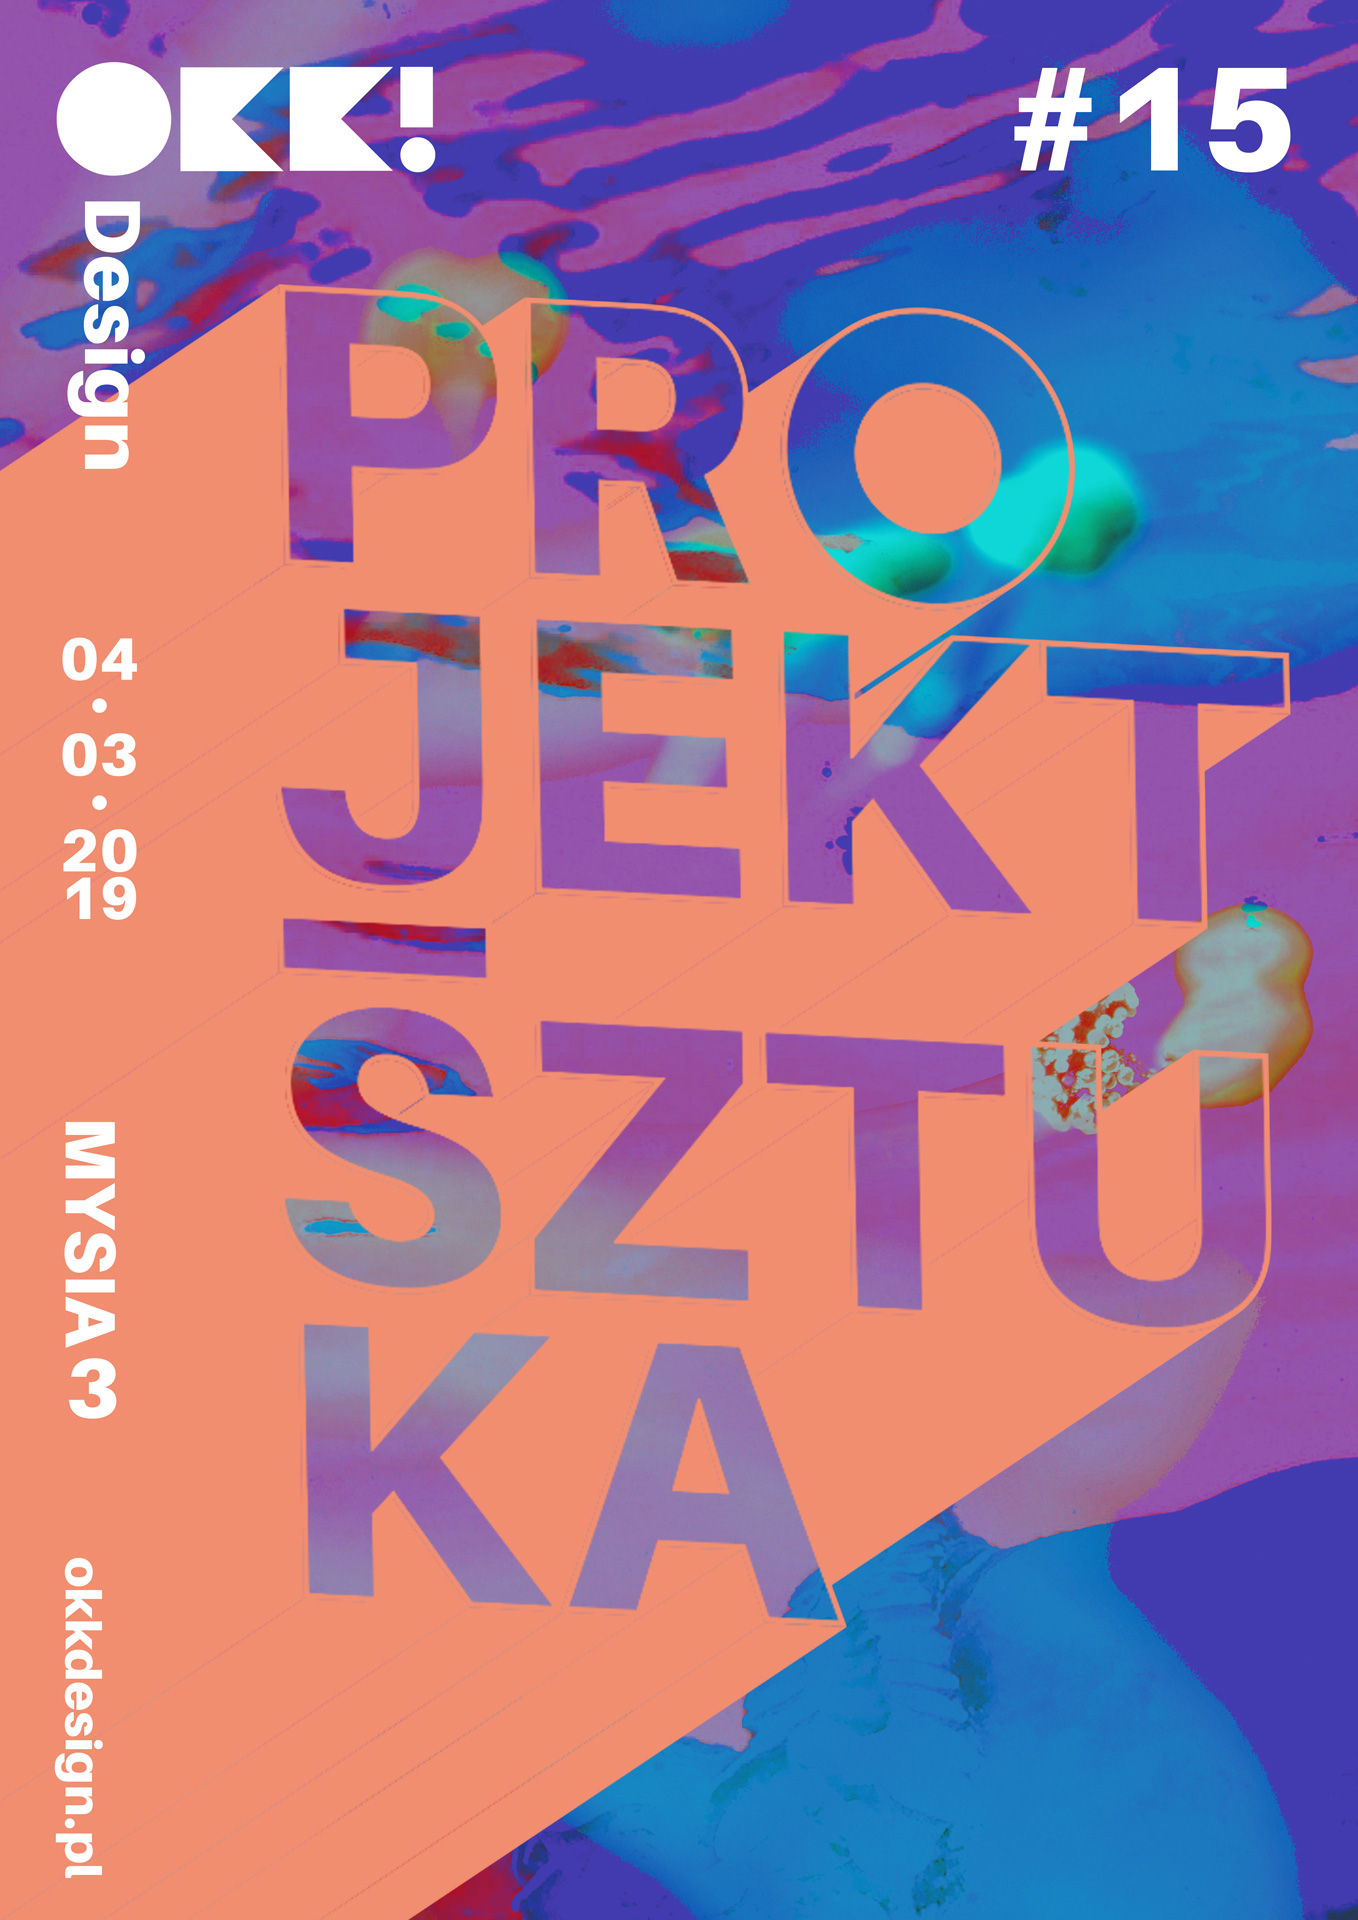 Projekt Sztuka_OKK! Design